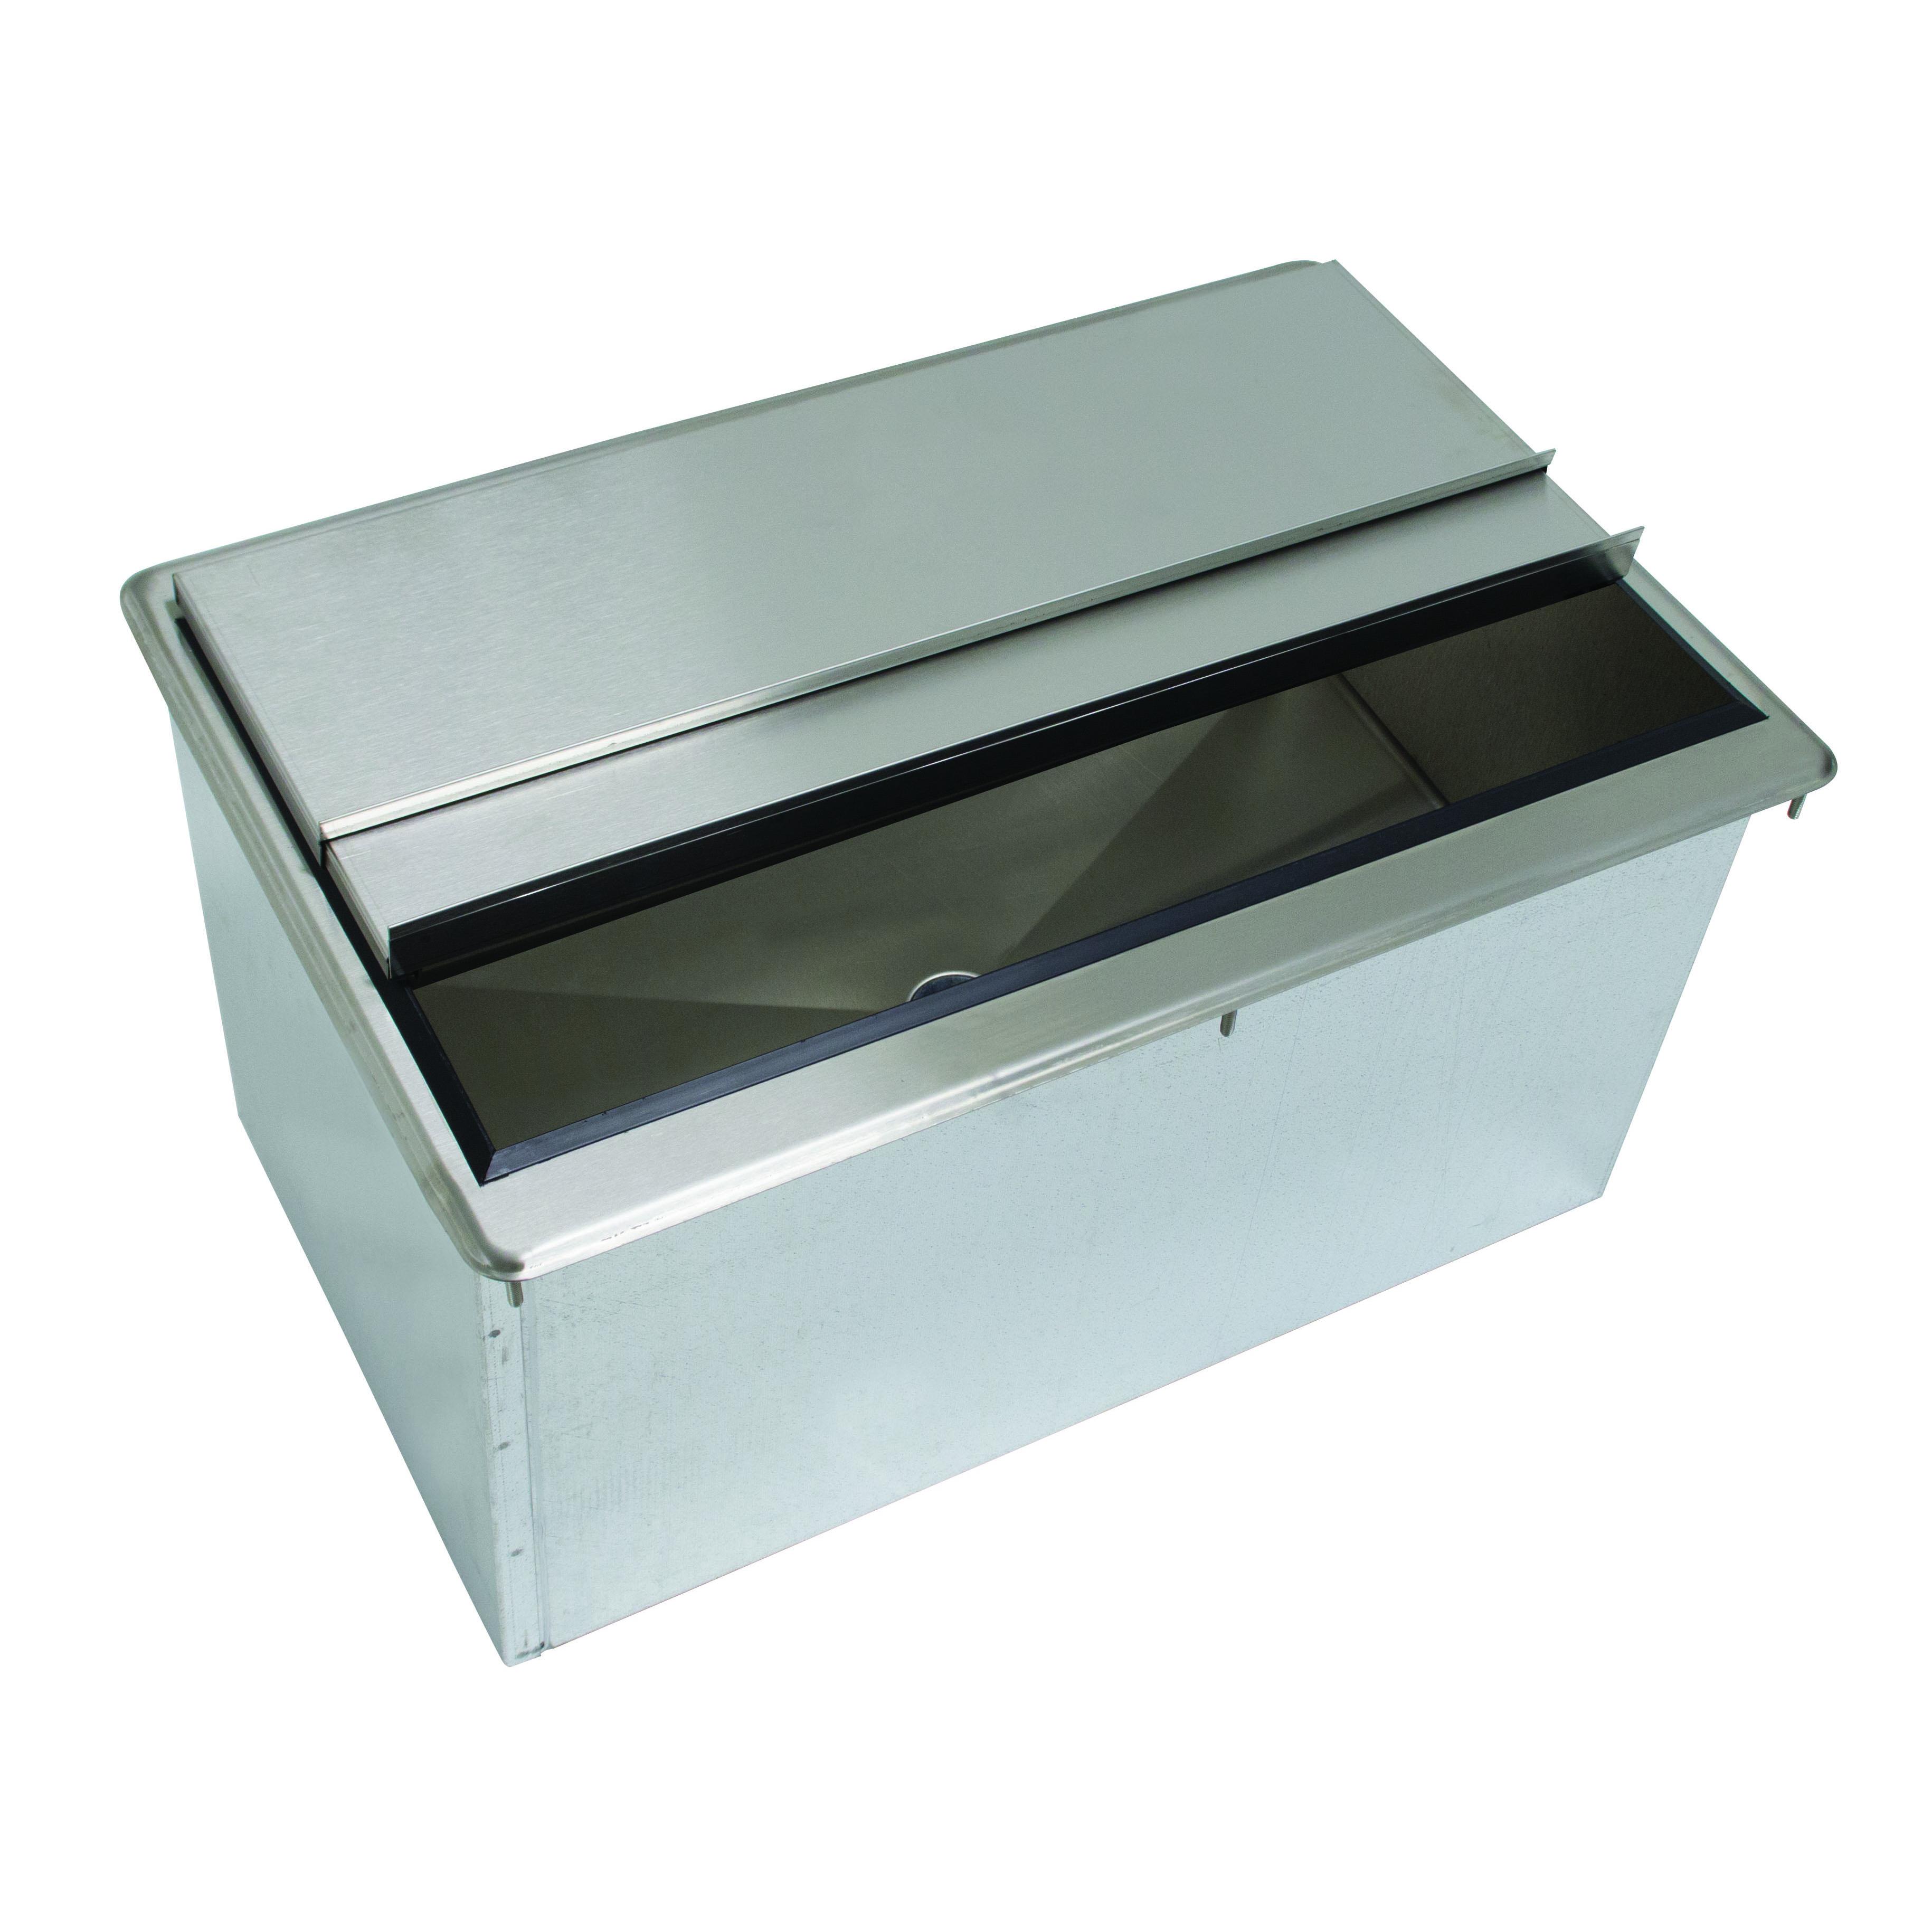 Advance Tabco D-30-IBL ice bin, drop-in